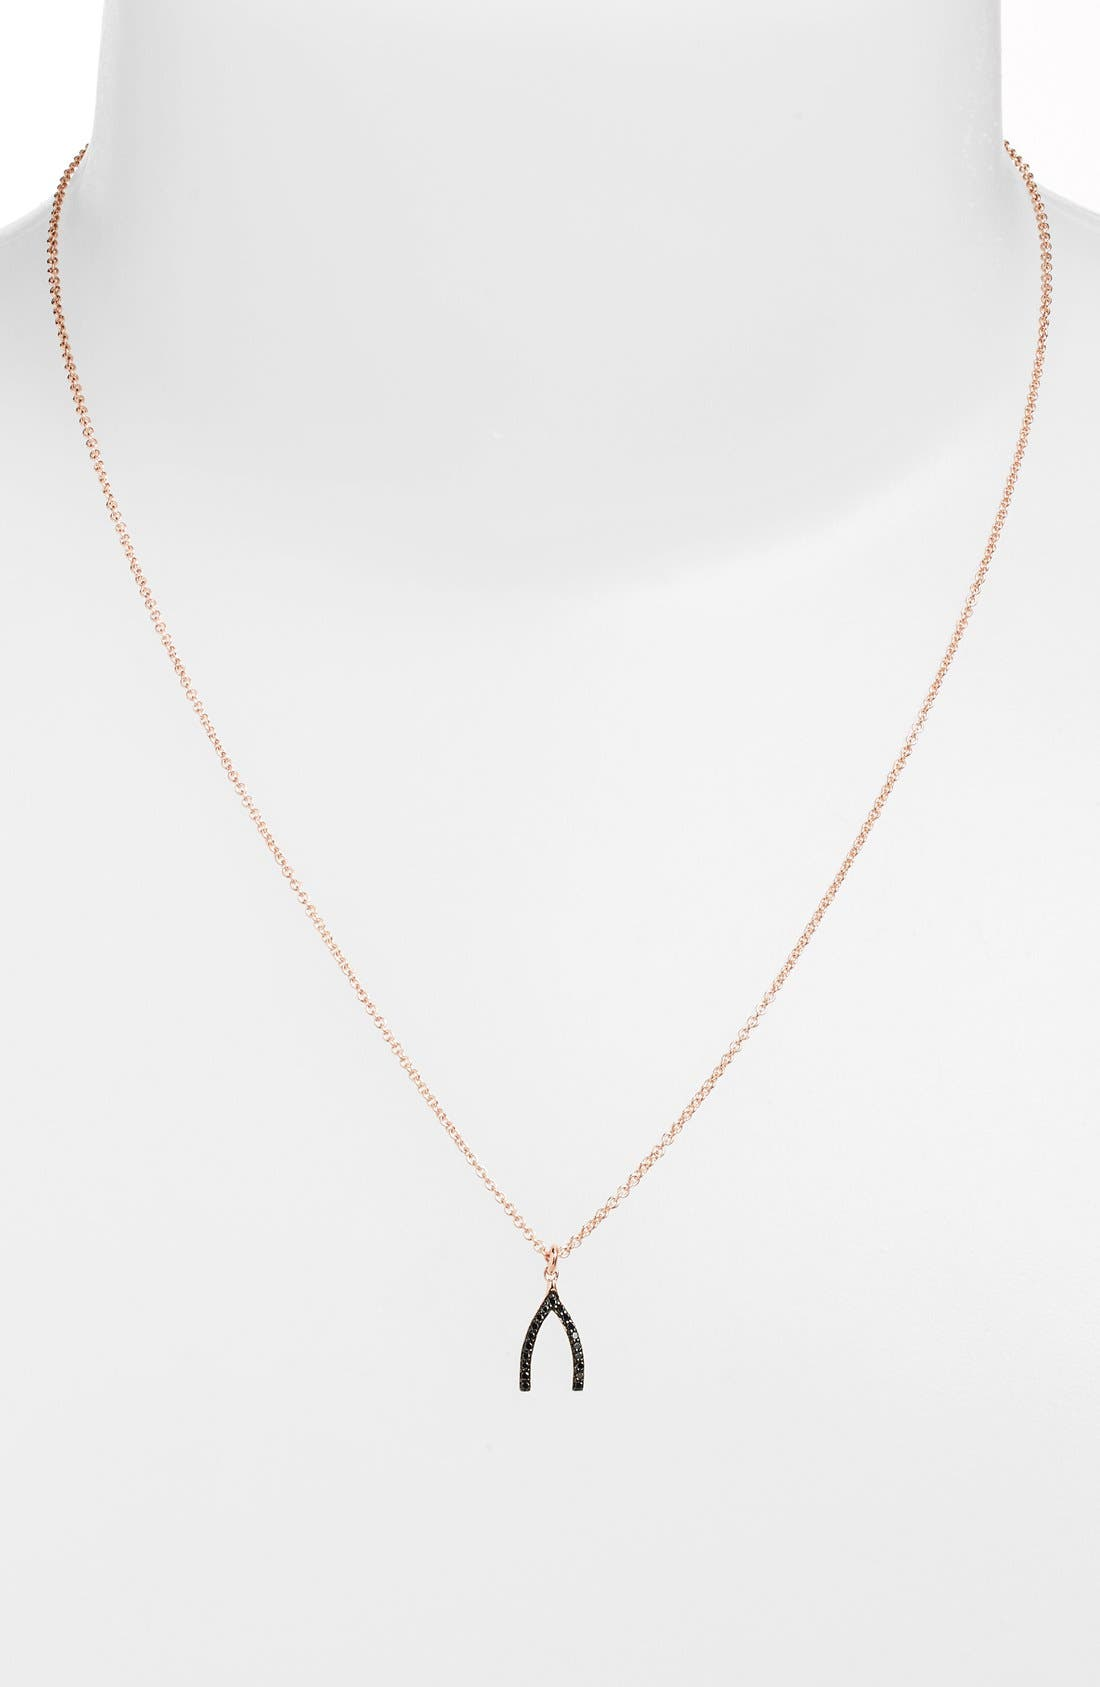 Alternate Image 1 Selected - Sugar Bean Jewelry Wishbone Pendant Necklace